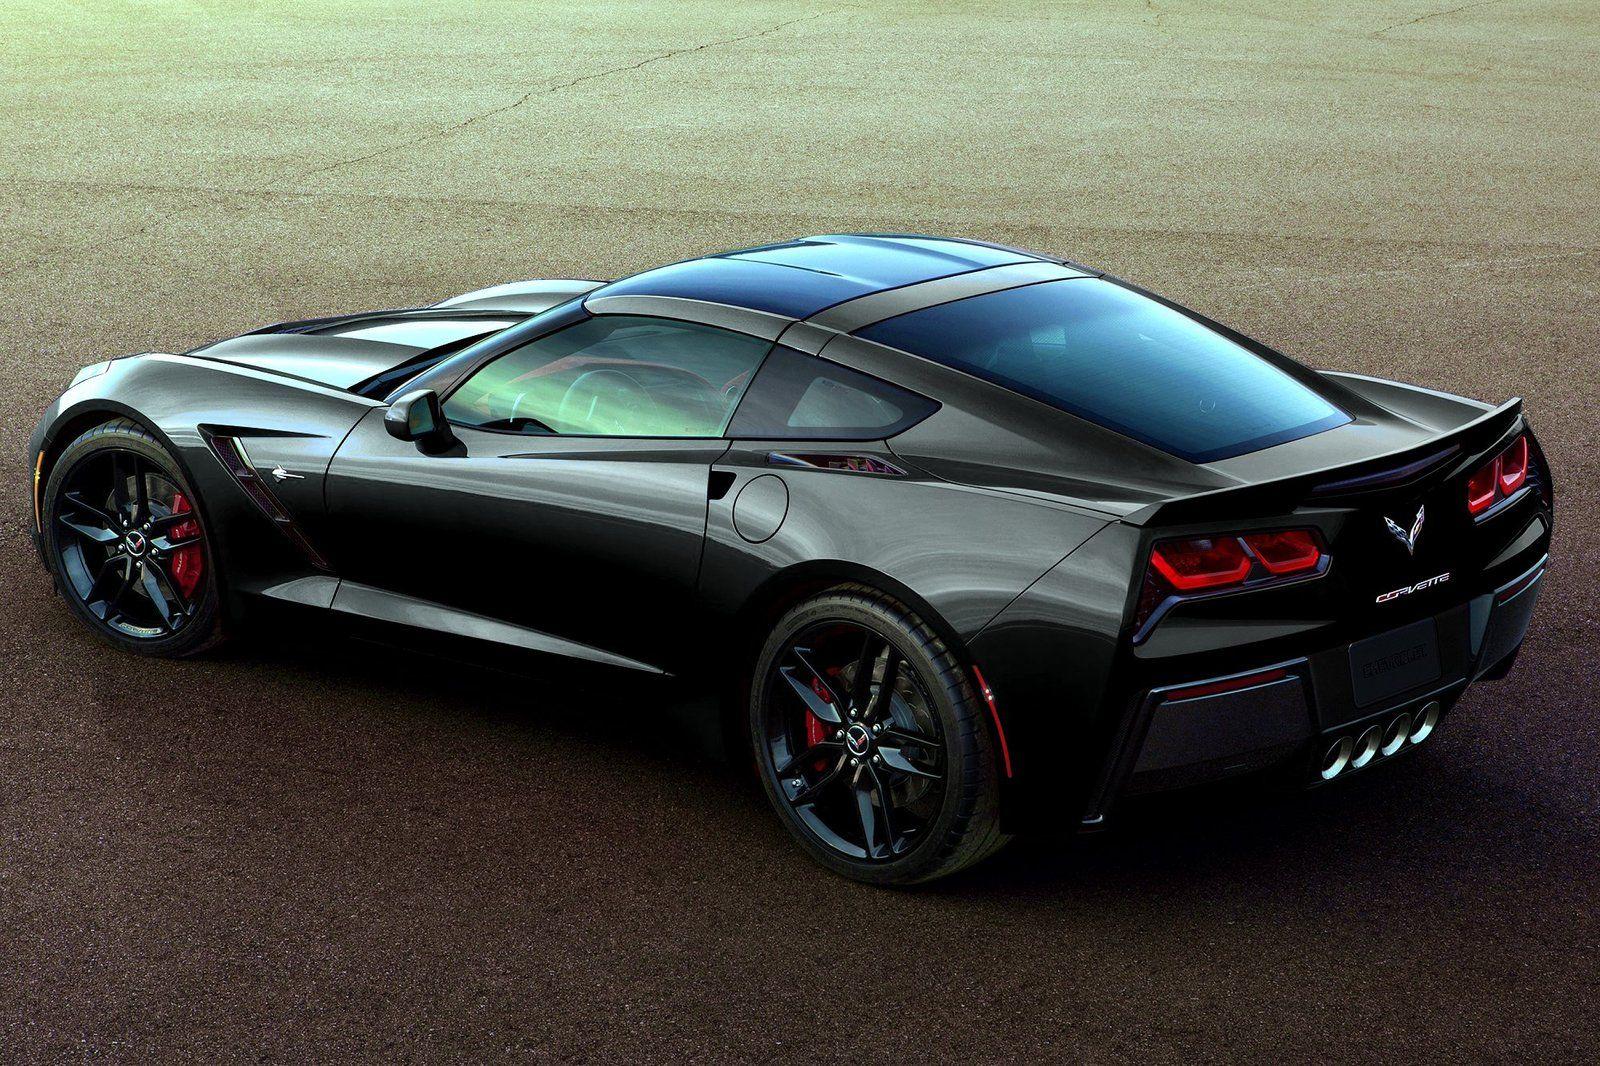 Chevy corvette news c7 release date latest corvette news 2015 corvette stingray coupes